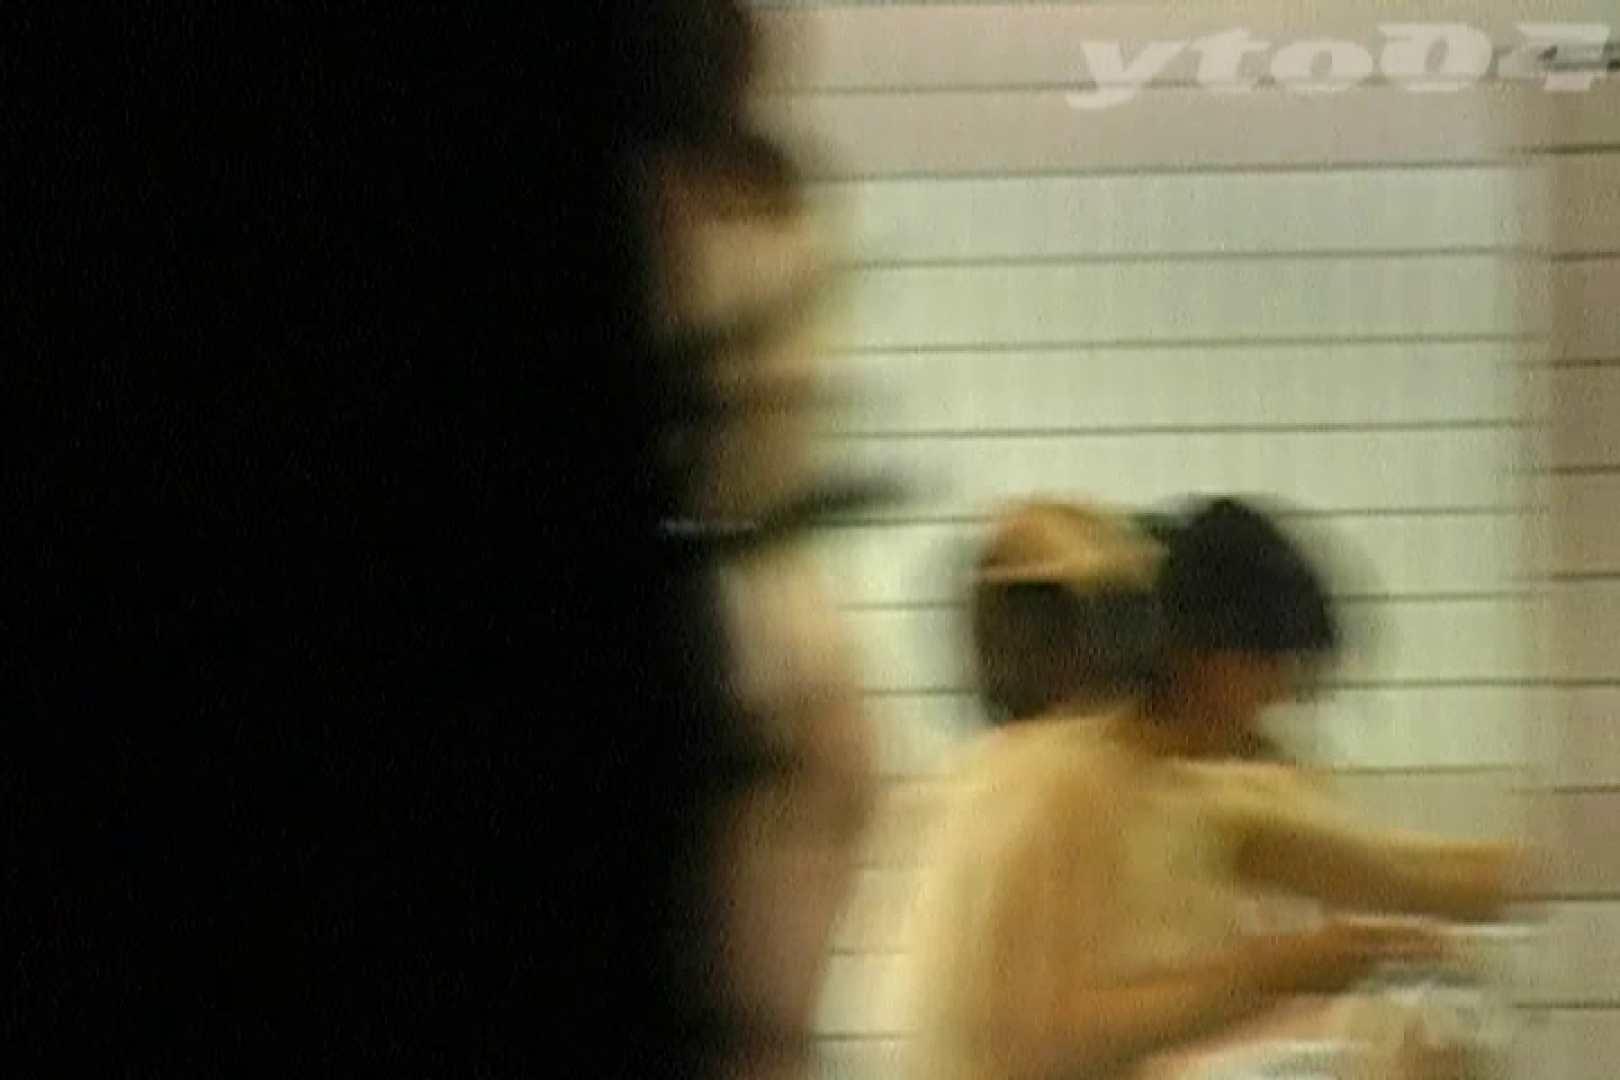 ▲復活限定▲合宿ホテル女風呂盗撮 Vol.24 名作  55pic 10